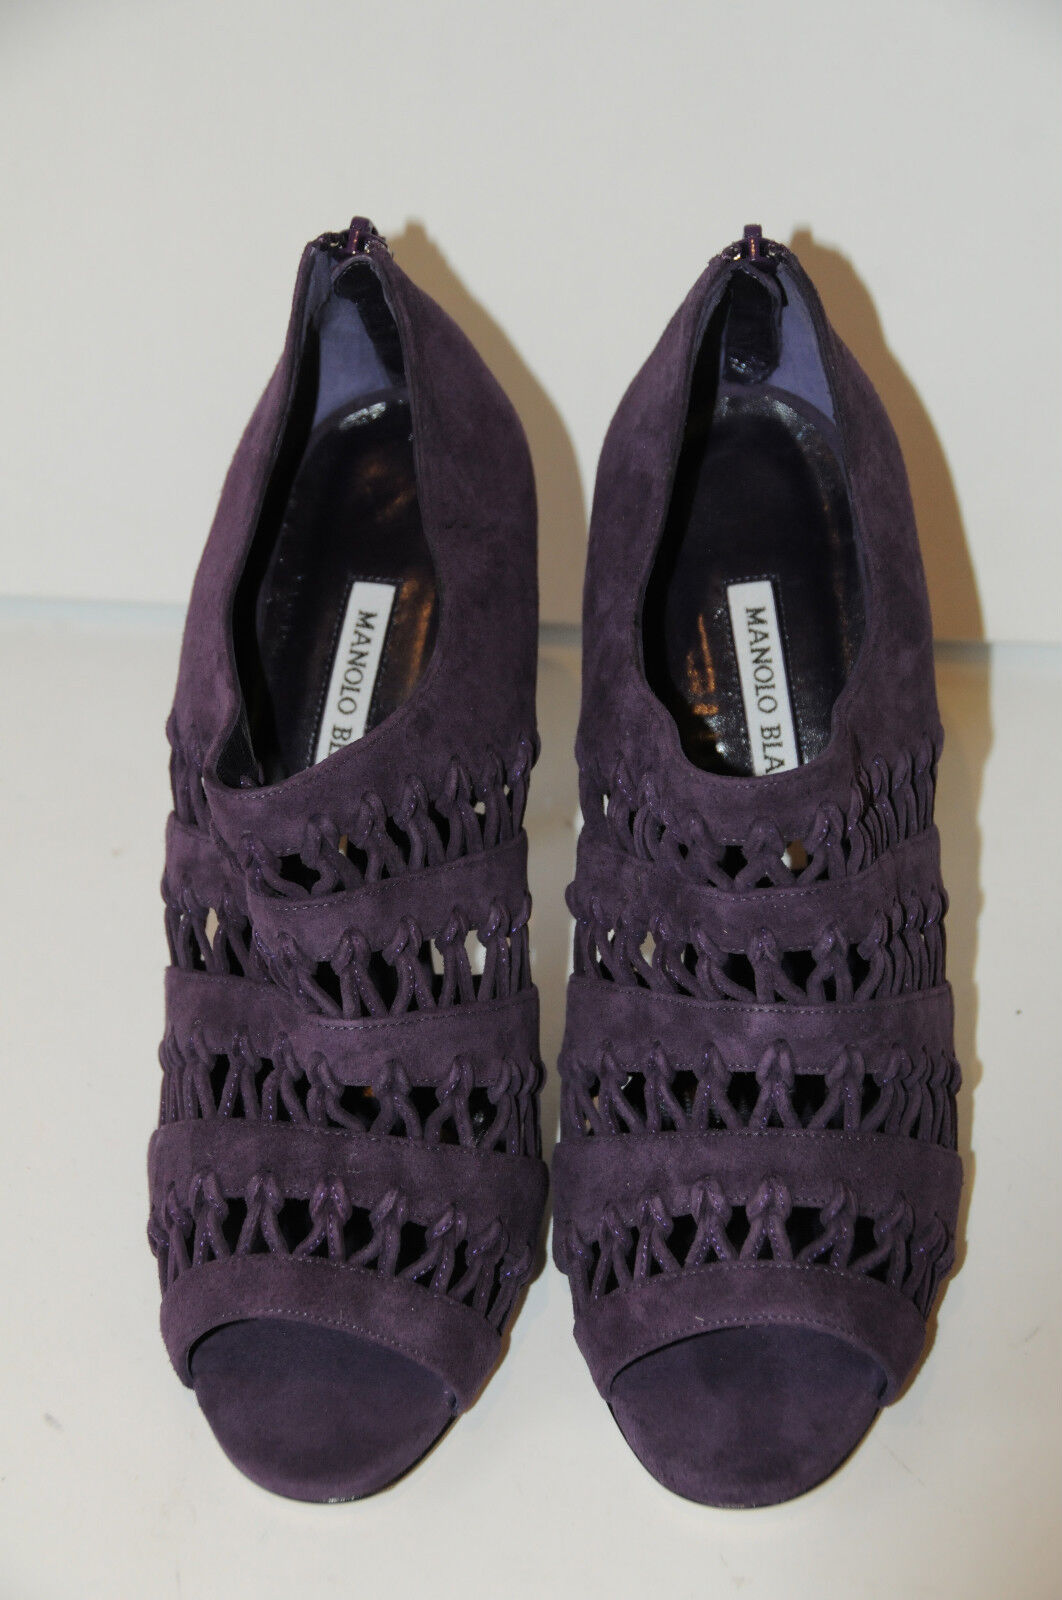 Neu Manolo Blahnik Pila Dk Lila Wildleder-Sandalen Stiefel Stiefel Stiefel Stiefel Schuhe 39.5  ca99dd